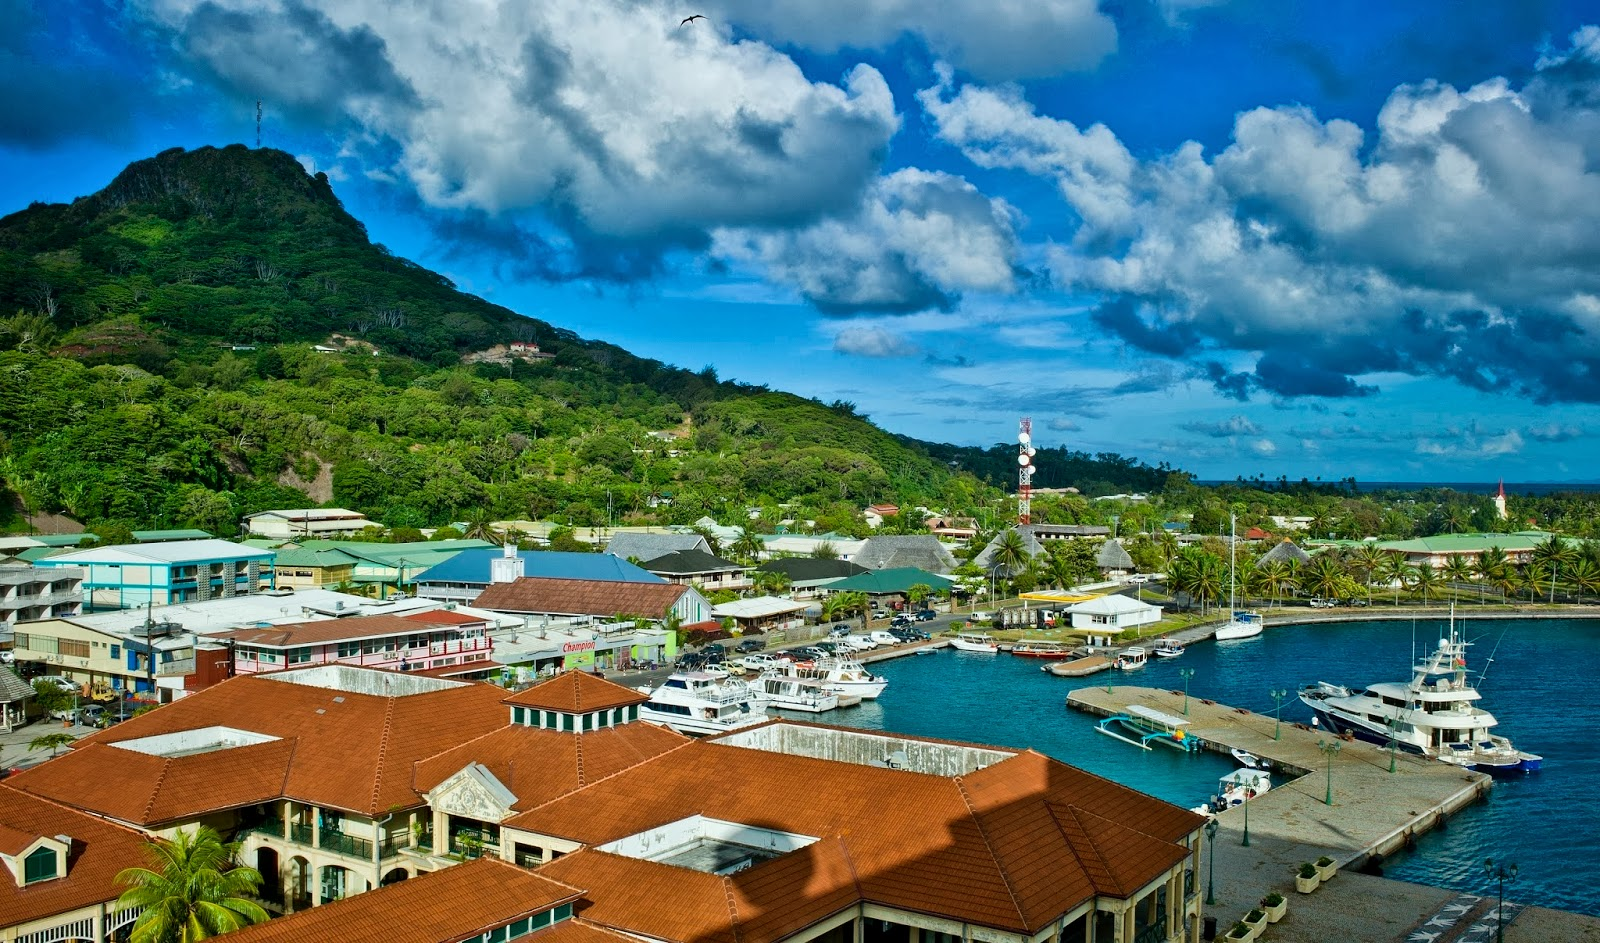 Tahiti French Polynesia  city pictures gallery : ... French Polynesia, Pacific Papeete, Tahiti, Mo'orea, Bora Bora